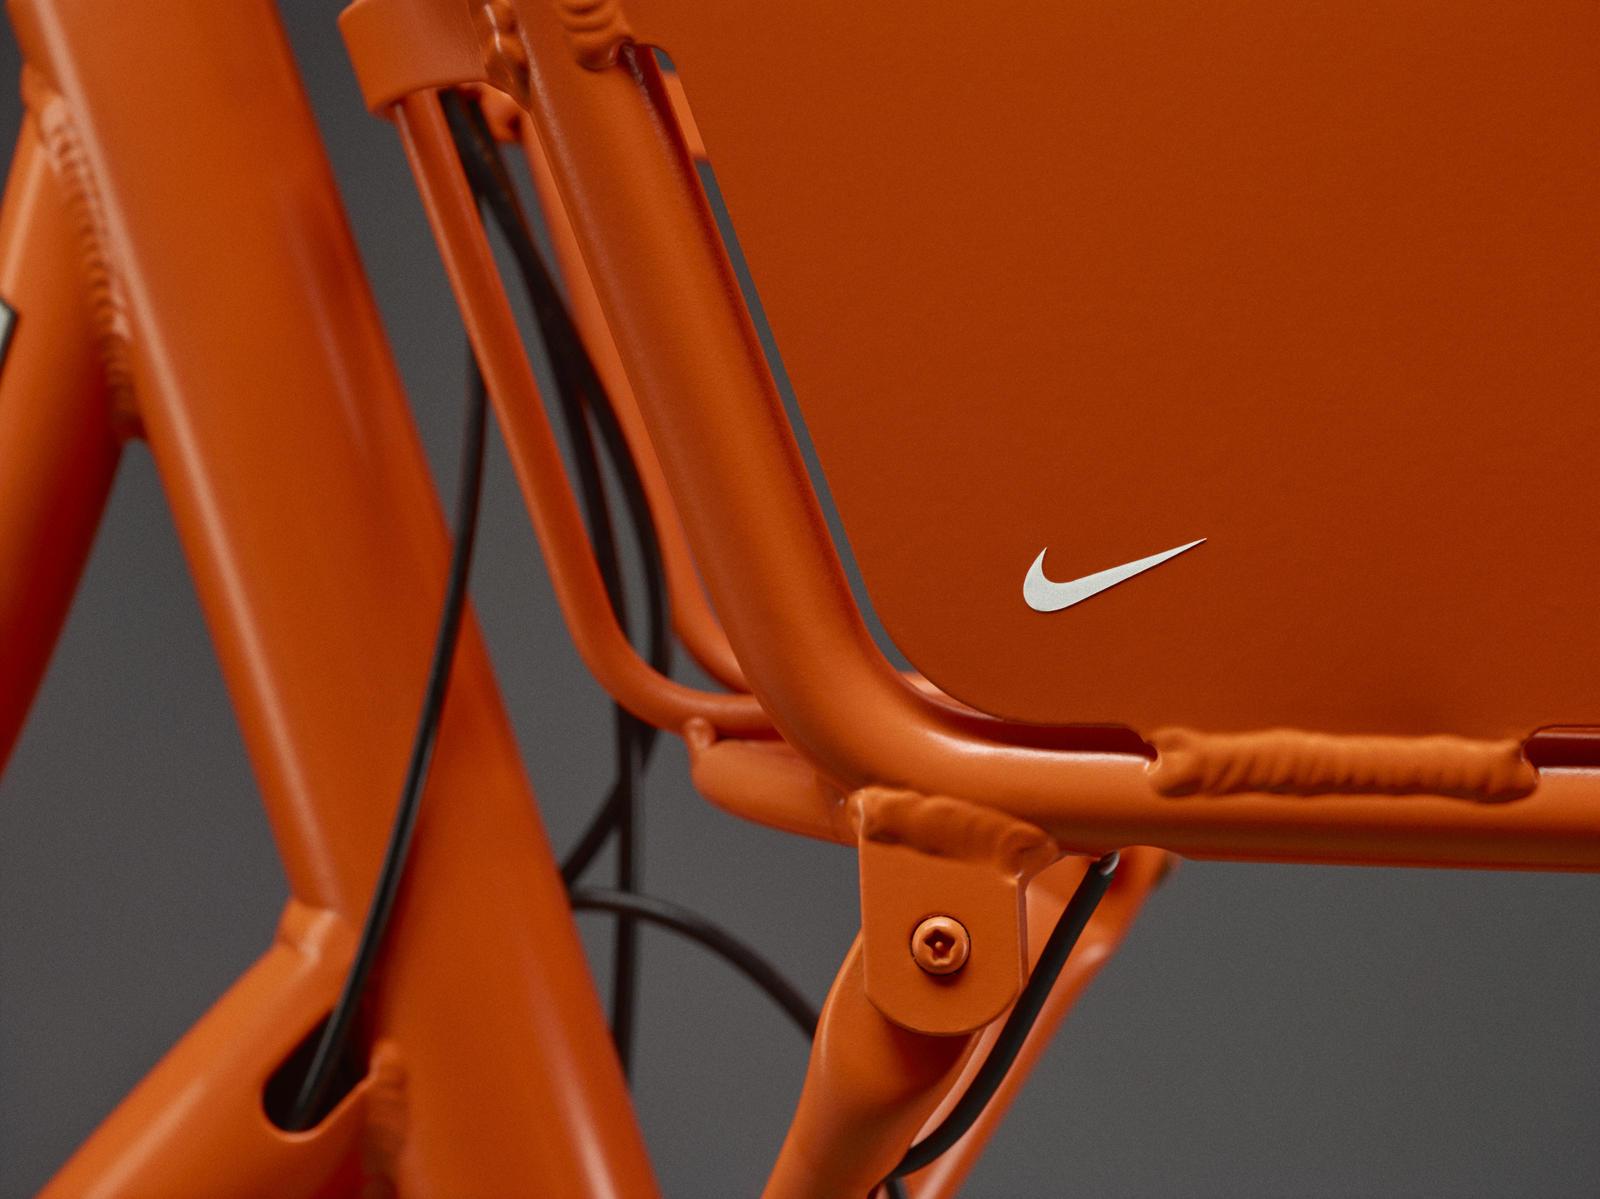 Nike_BIKETOWN_det_007_native_1600